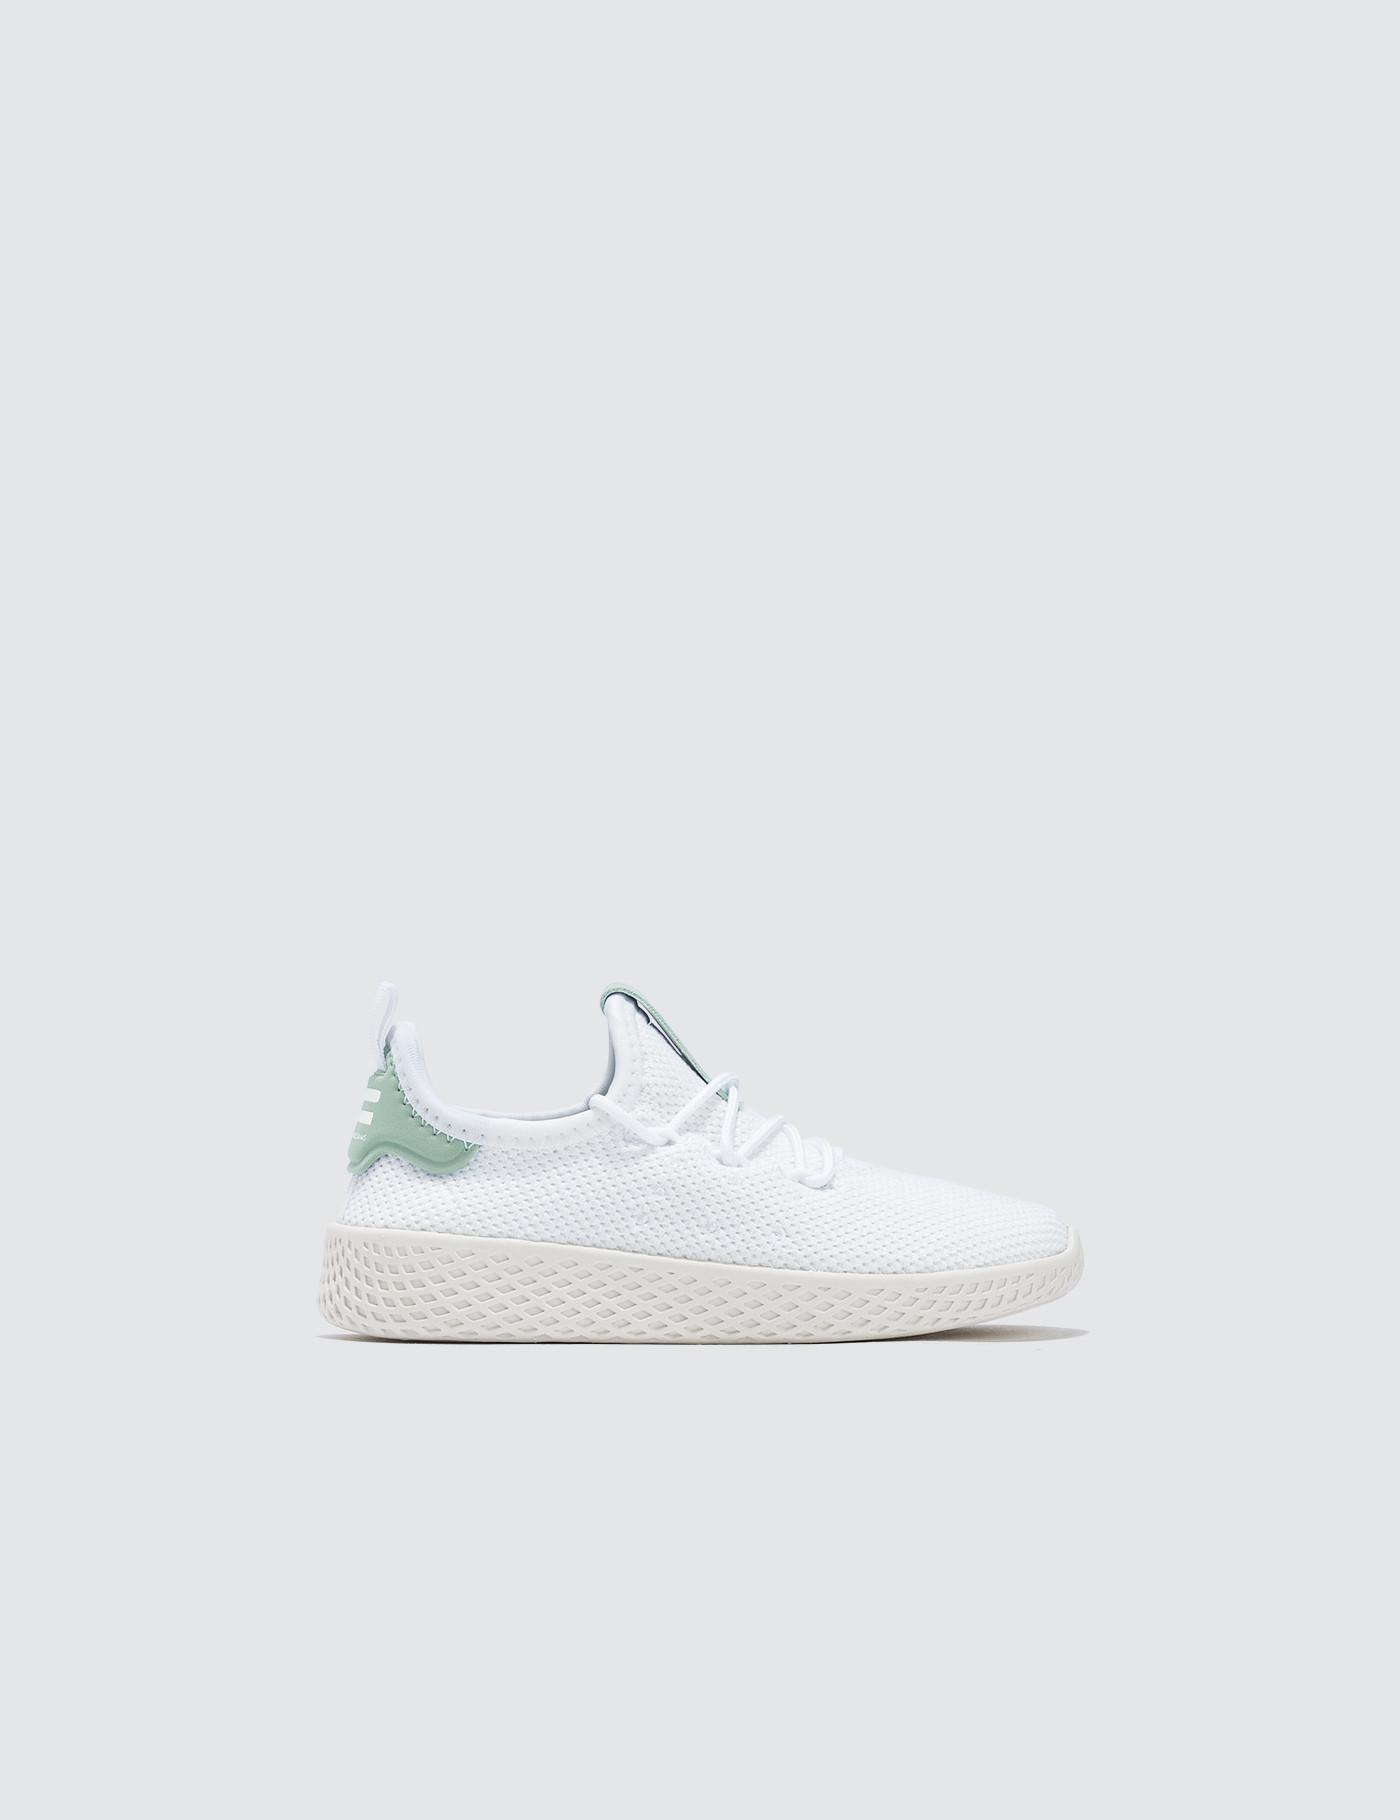 90d8192a4 adidas Originals. Men s White Pharrell Williams X Adidas Pw Tennis Hu  Infants